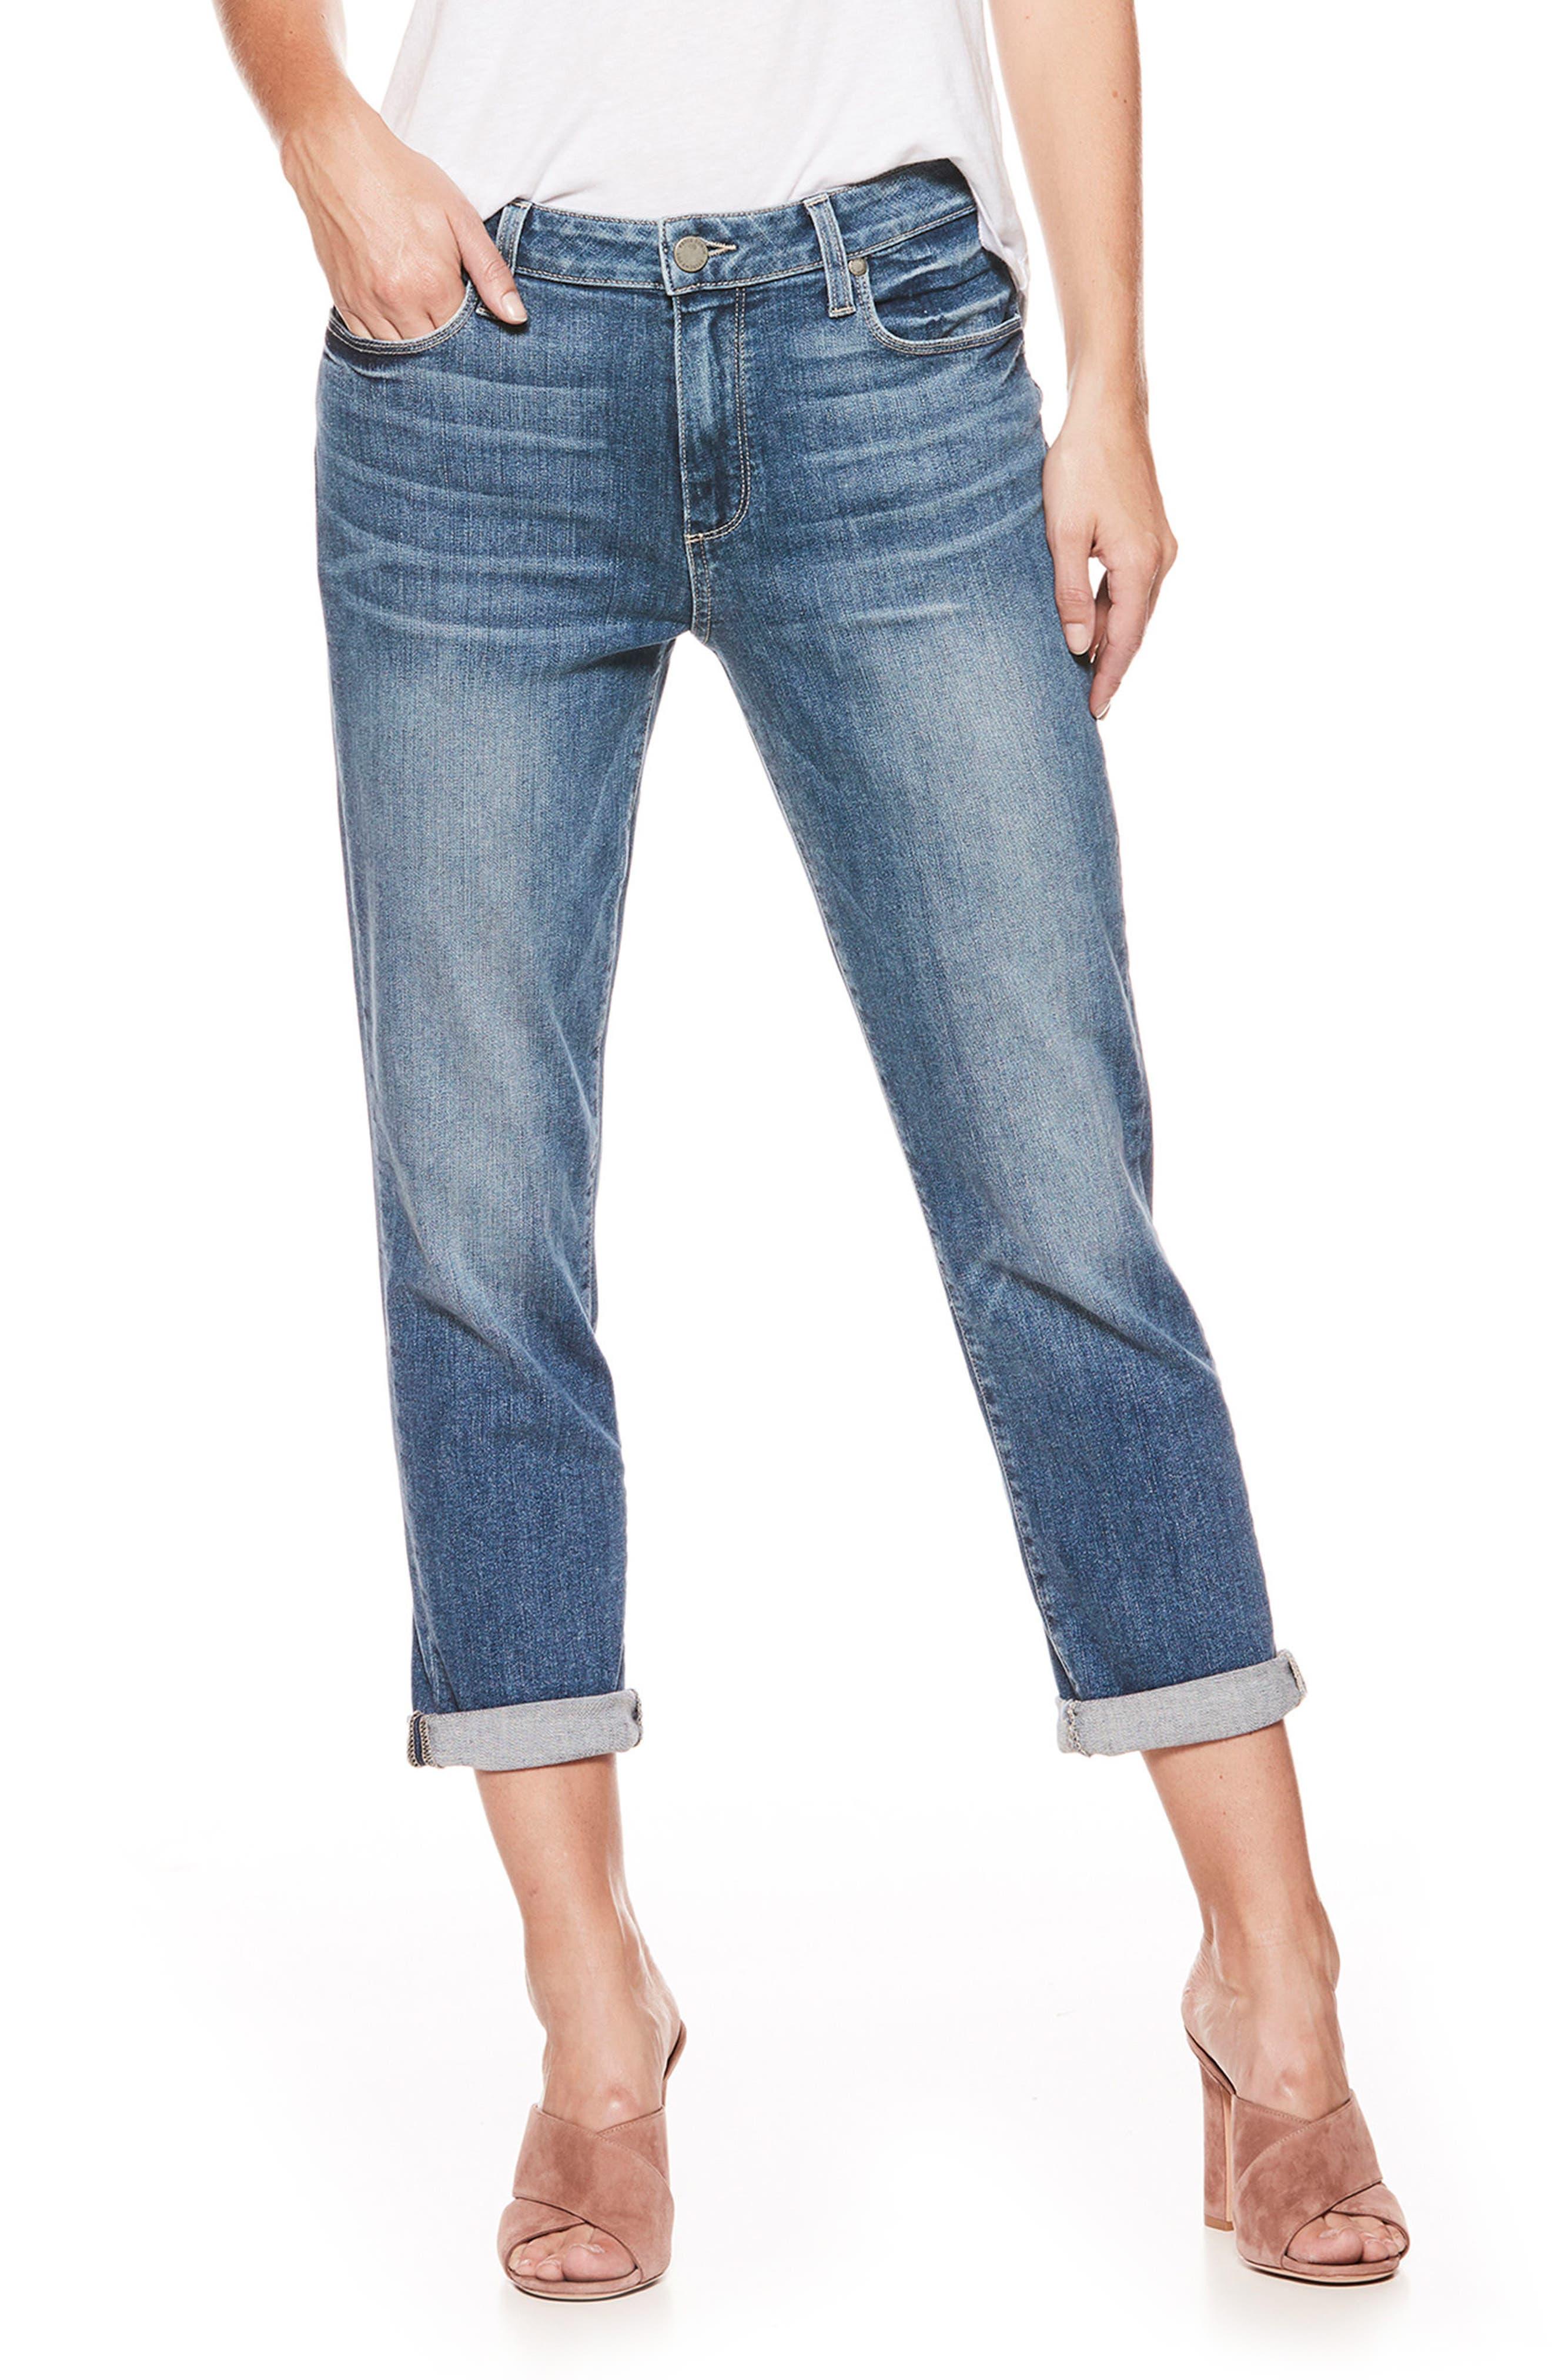 PAIGE Jimmy Jimmy High Waist Crop Boyfriend Jeans (Kanan)